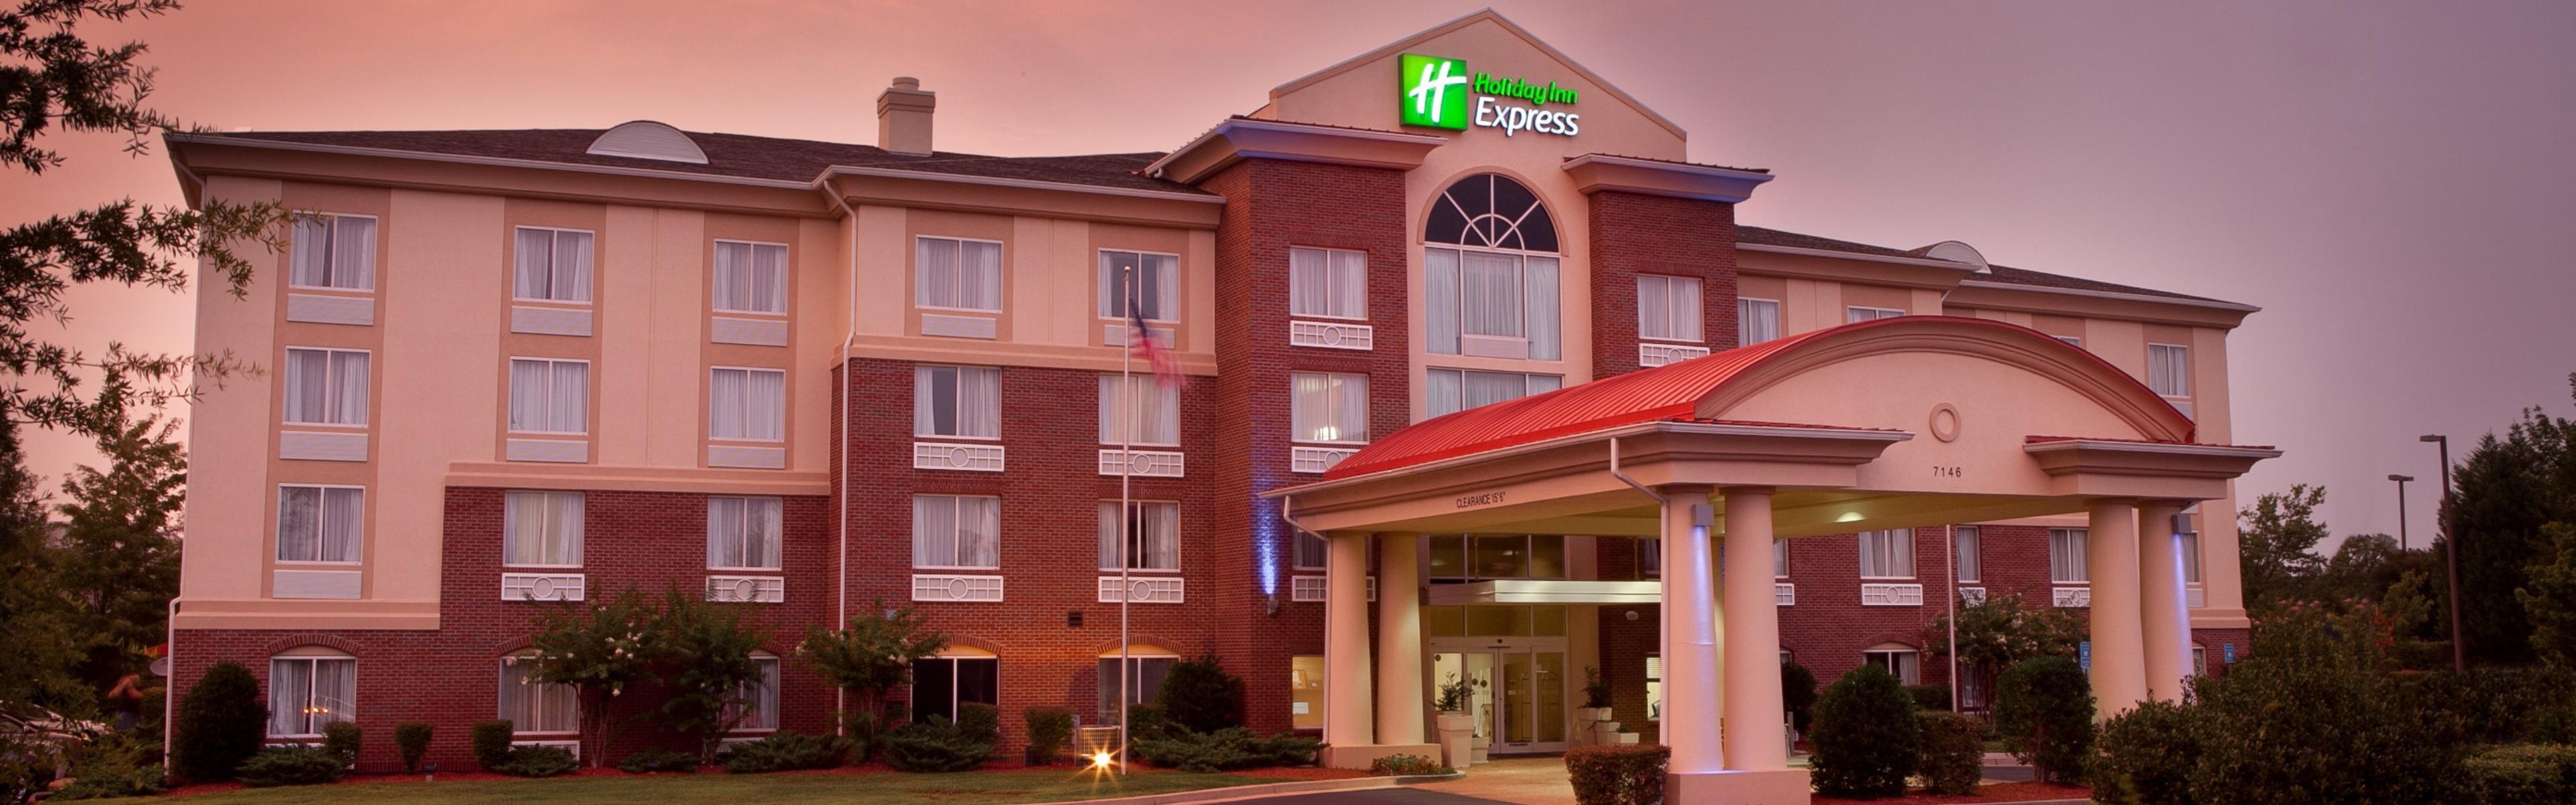 Holiday Inn Express U0026 Suites Atlanta Johns Creek